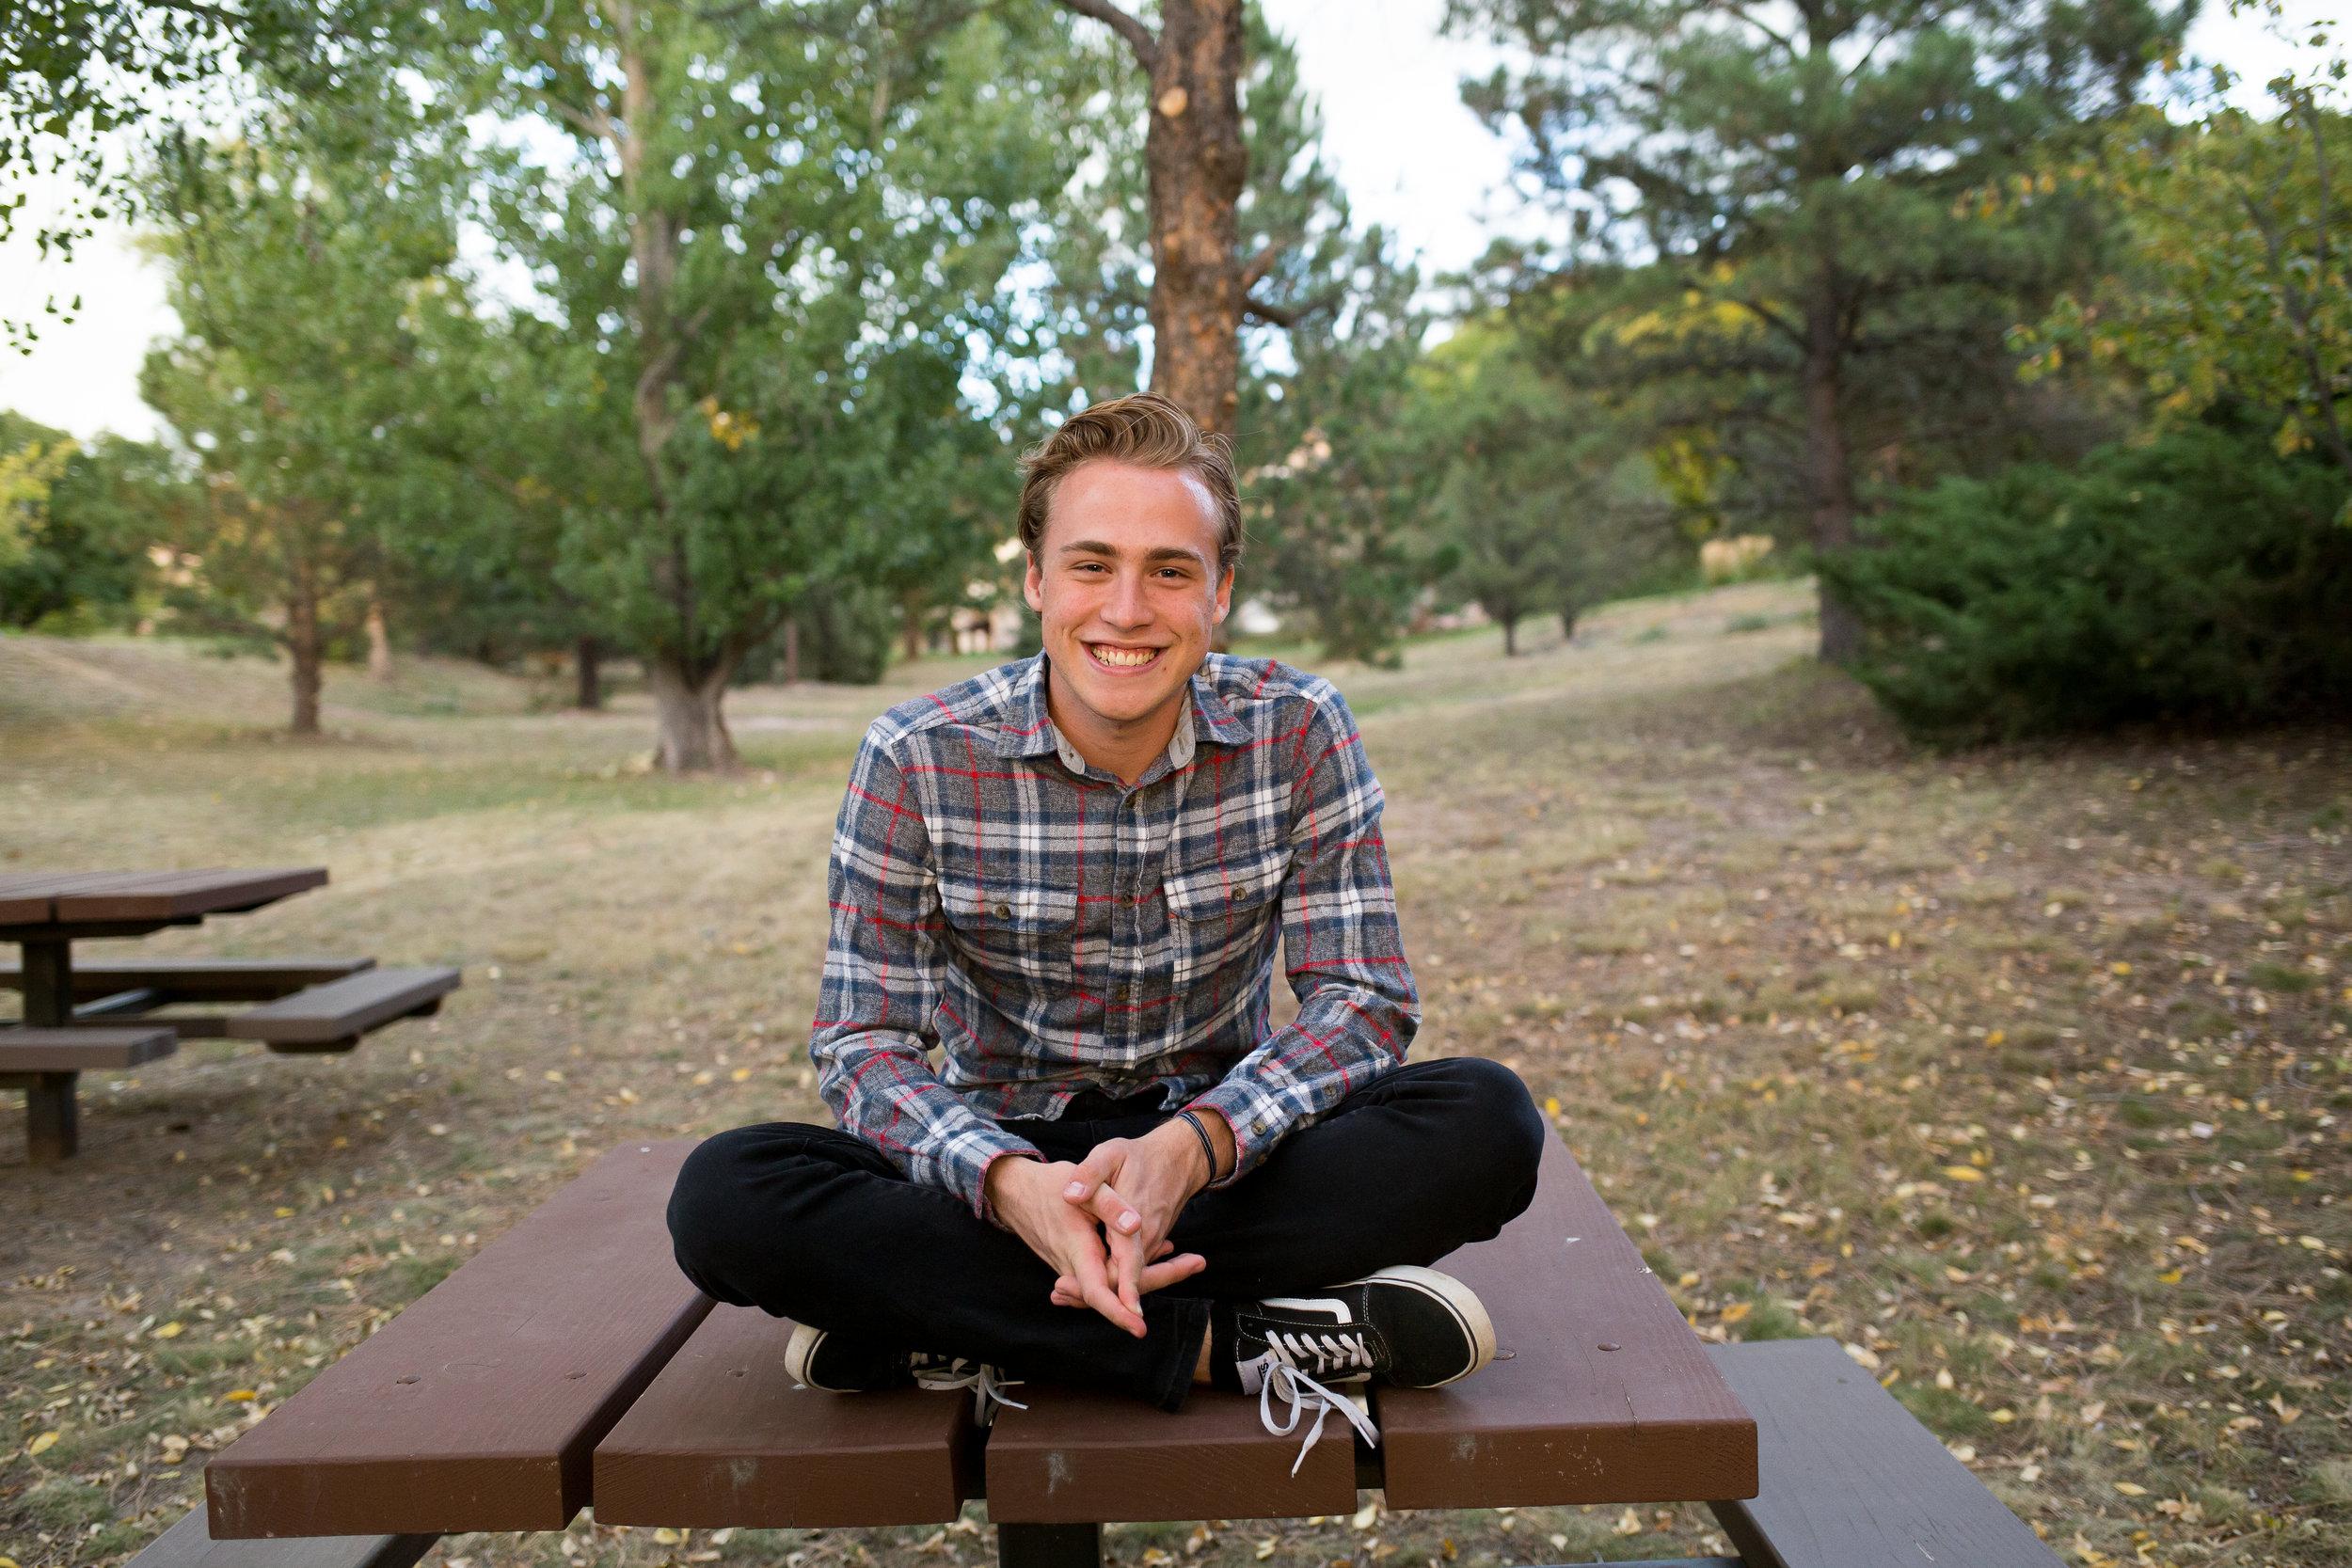 Senior boy sitting in park | Colorado Springs Senior Photography | Colorado Springs Senior Photographer | Stacy Carosa Photography | Colorado Senior Portraits | Doherty High School